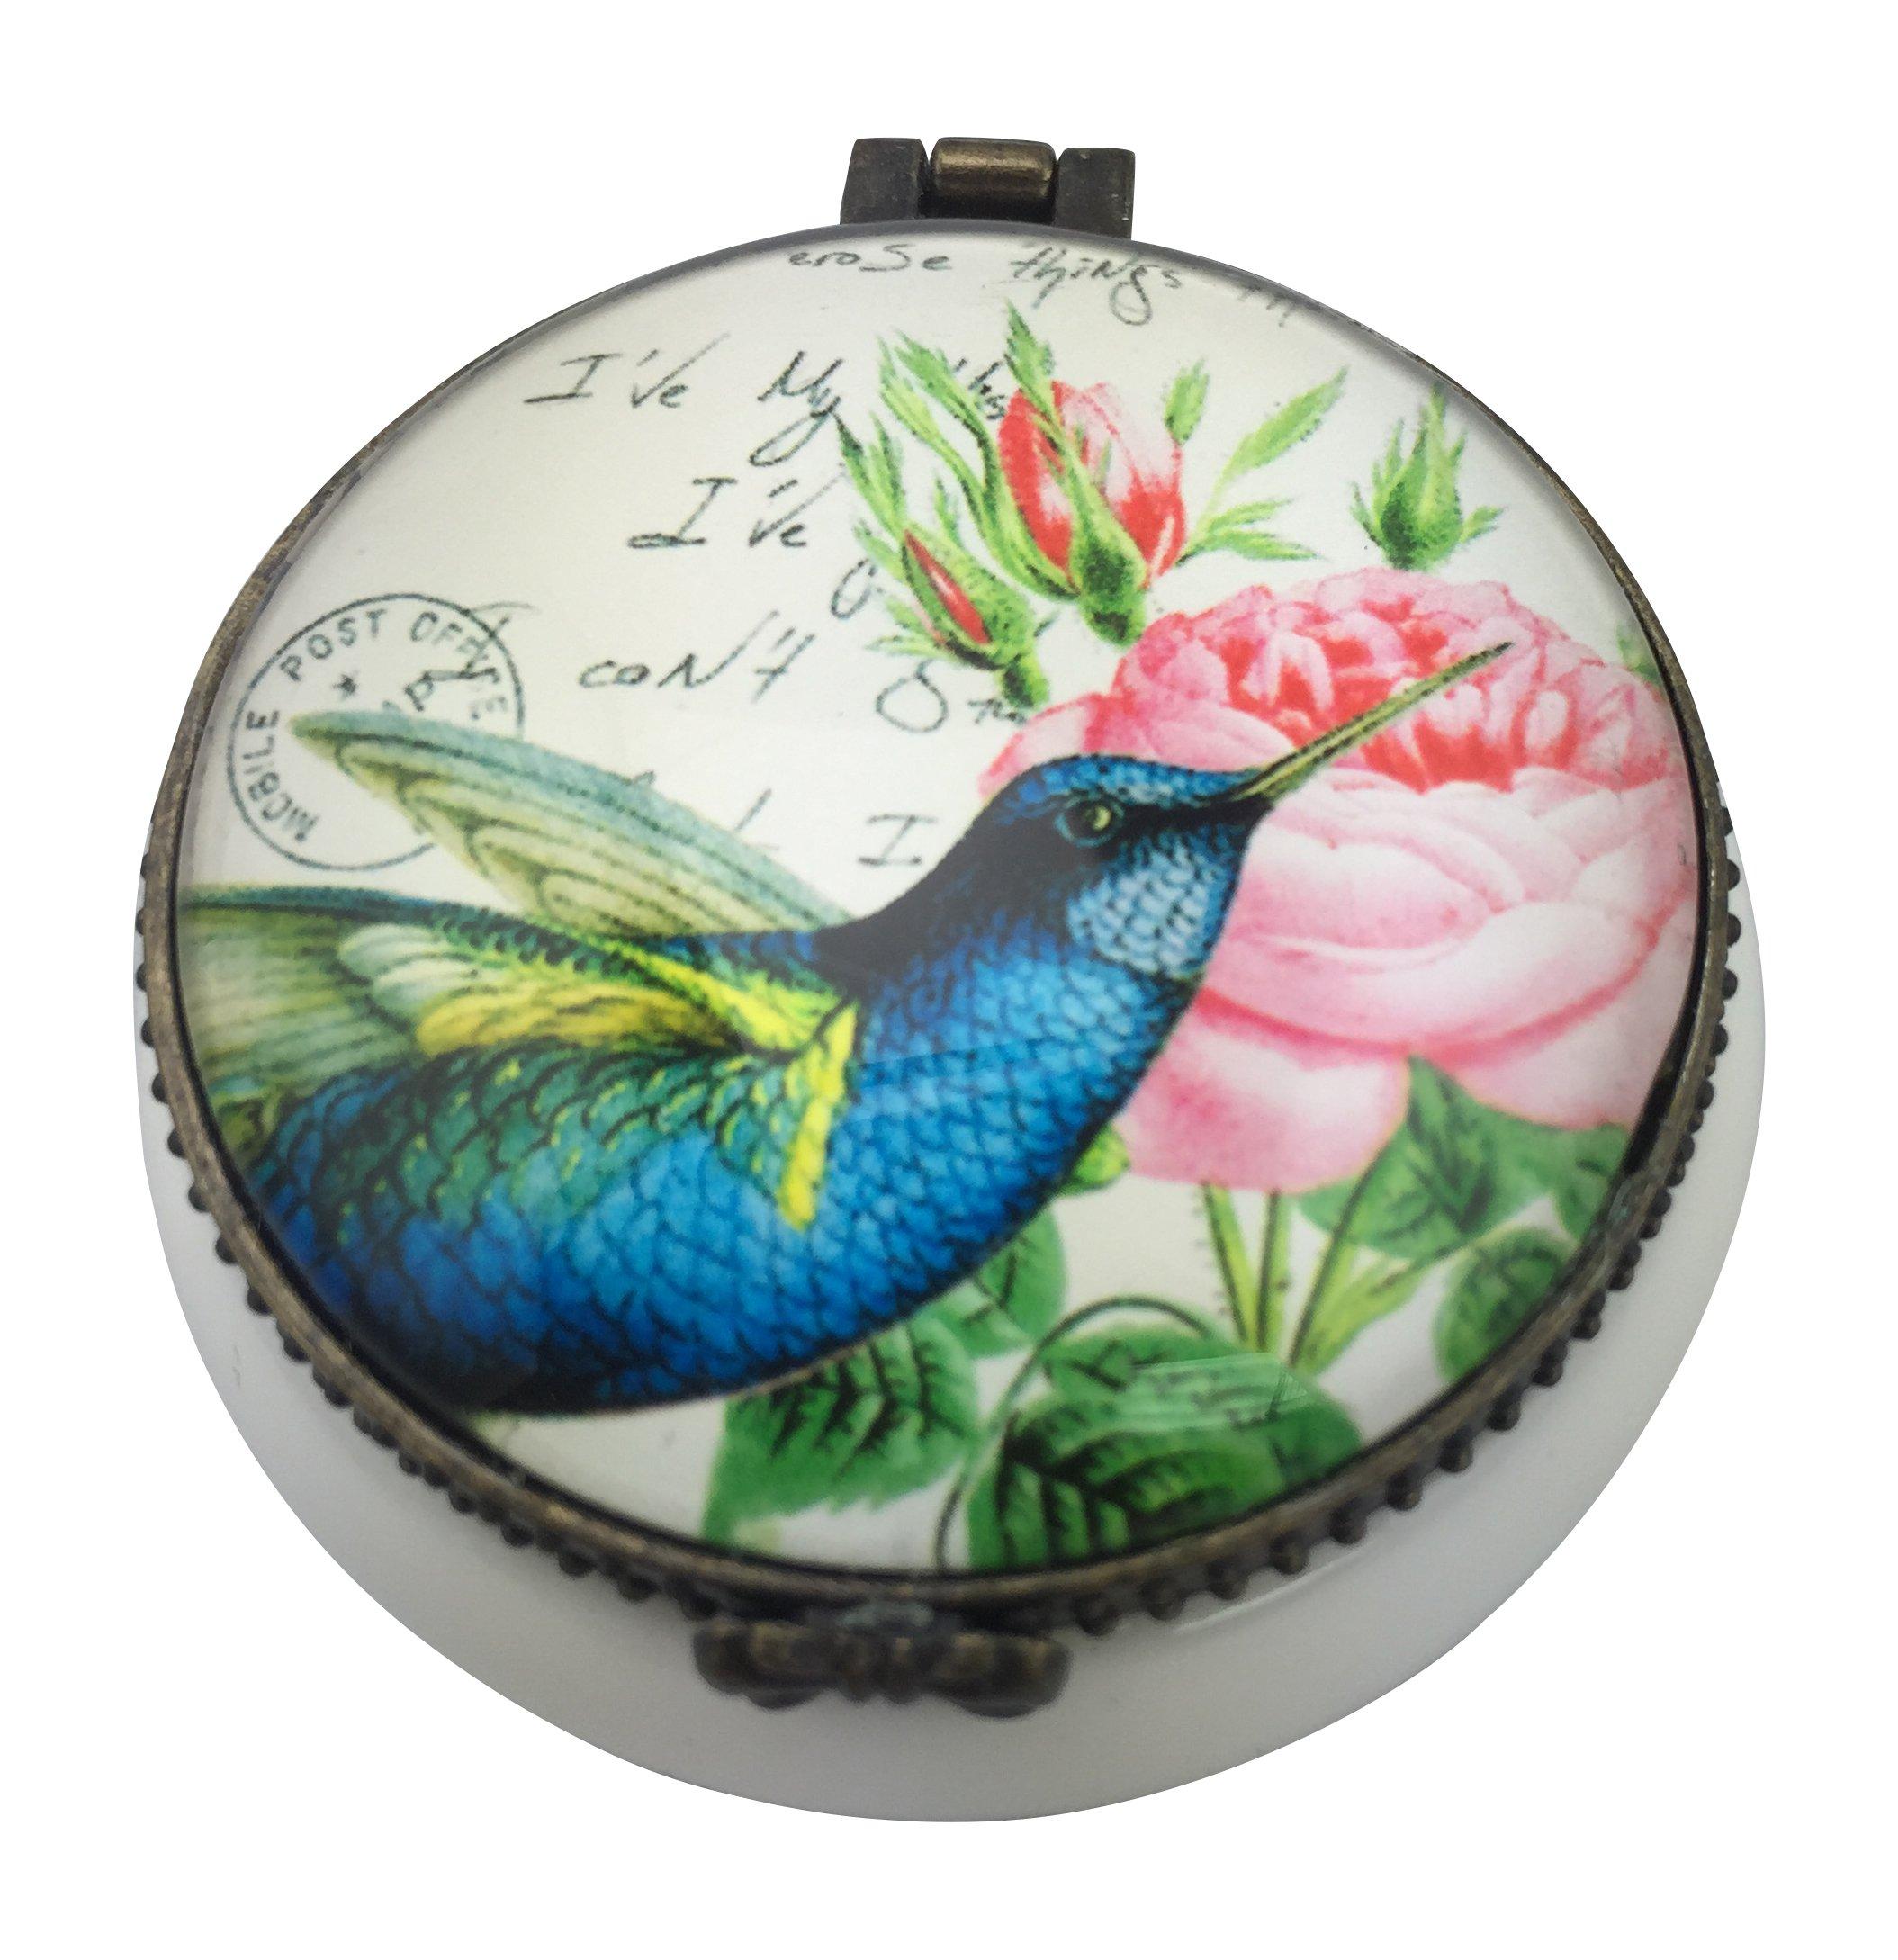 Value Arts Blue Hummingbird French Inspired Trinket Box, Ceramic and Glass, 2 Inch Diameter